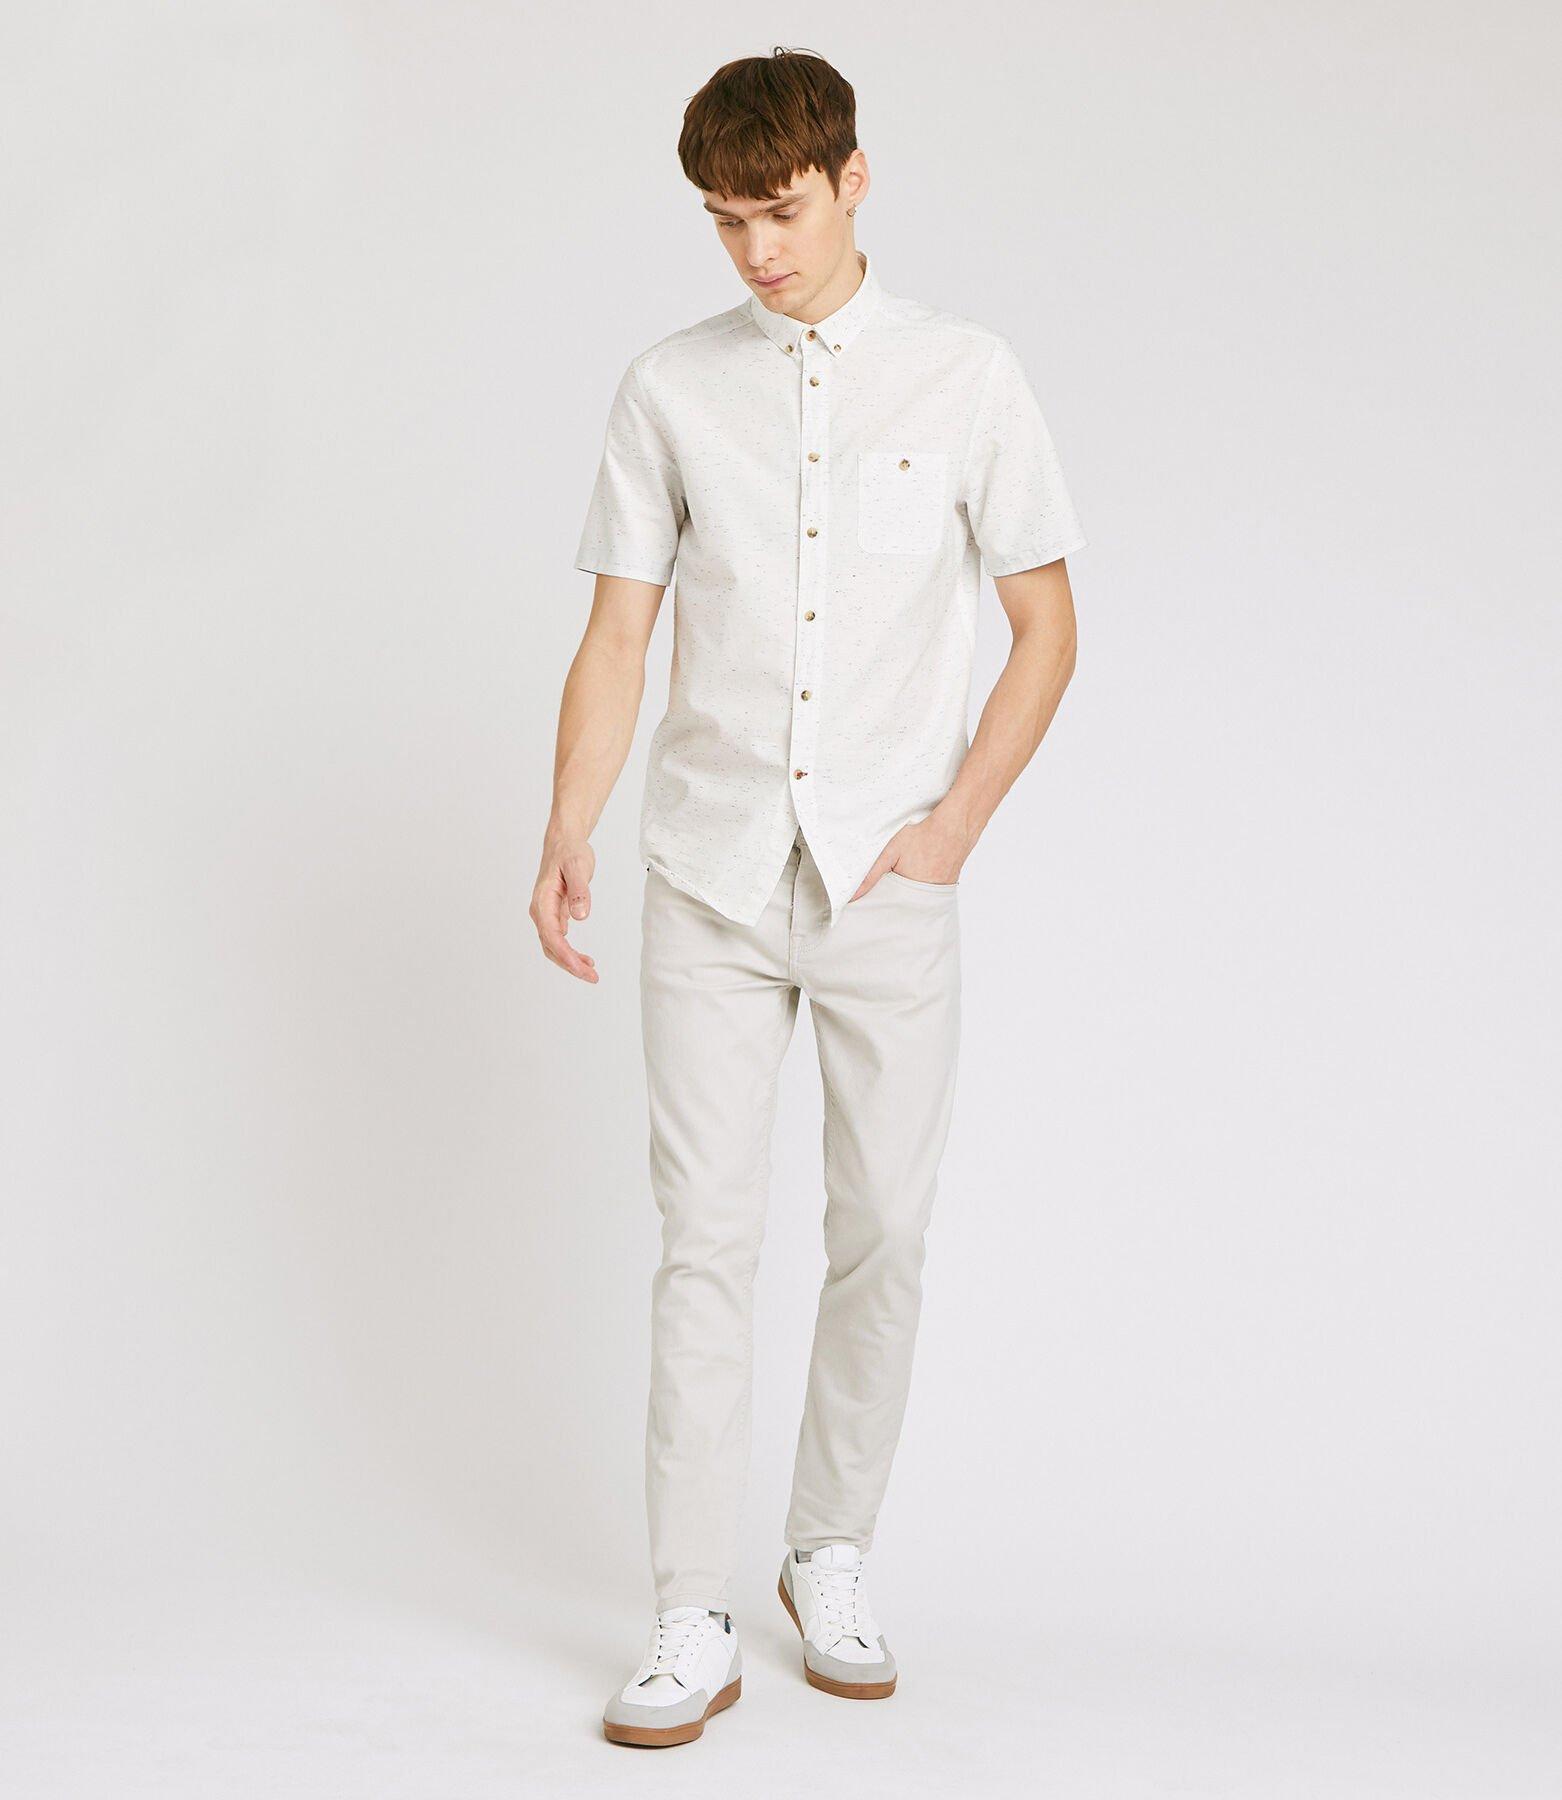 Chemise Sportswear Blanc